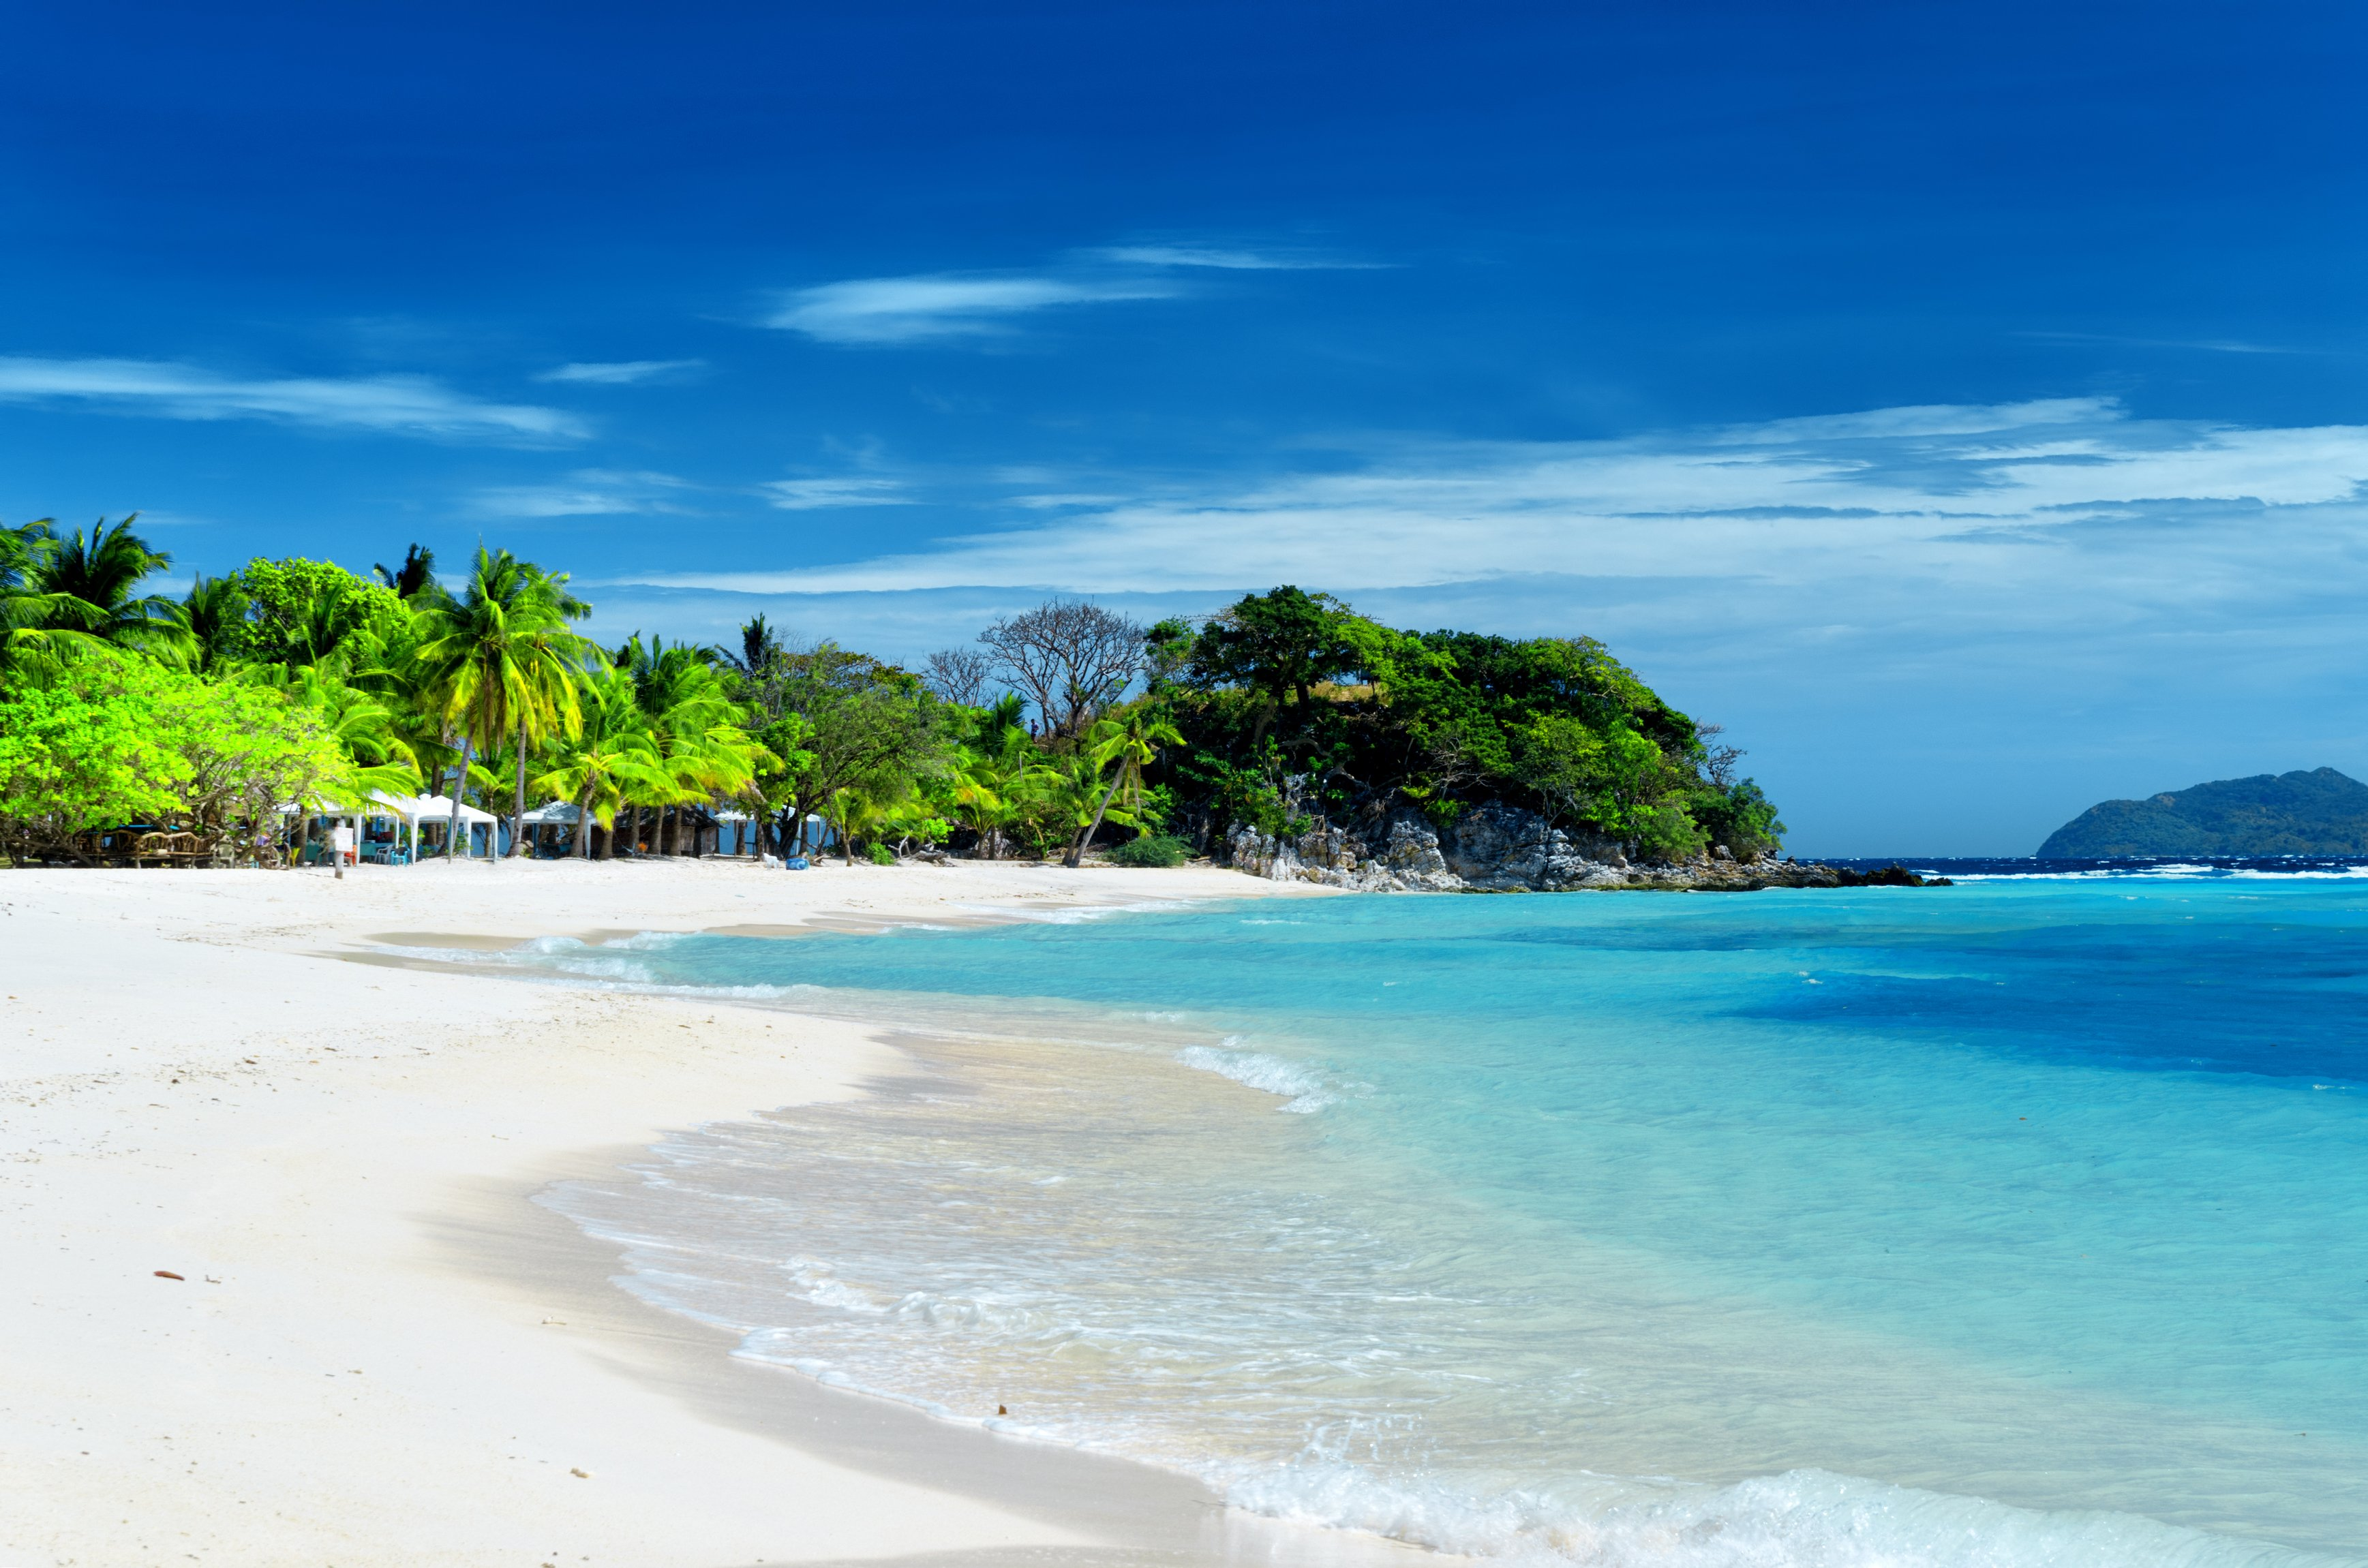 Spiaggia bianca incontaminata dell'Isola Malcapuya